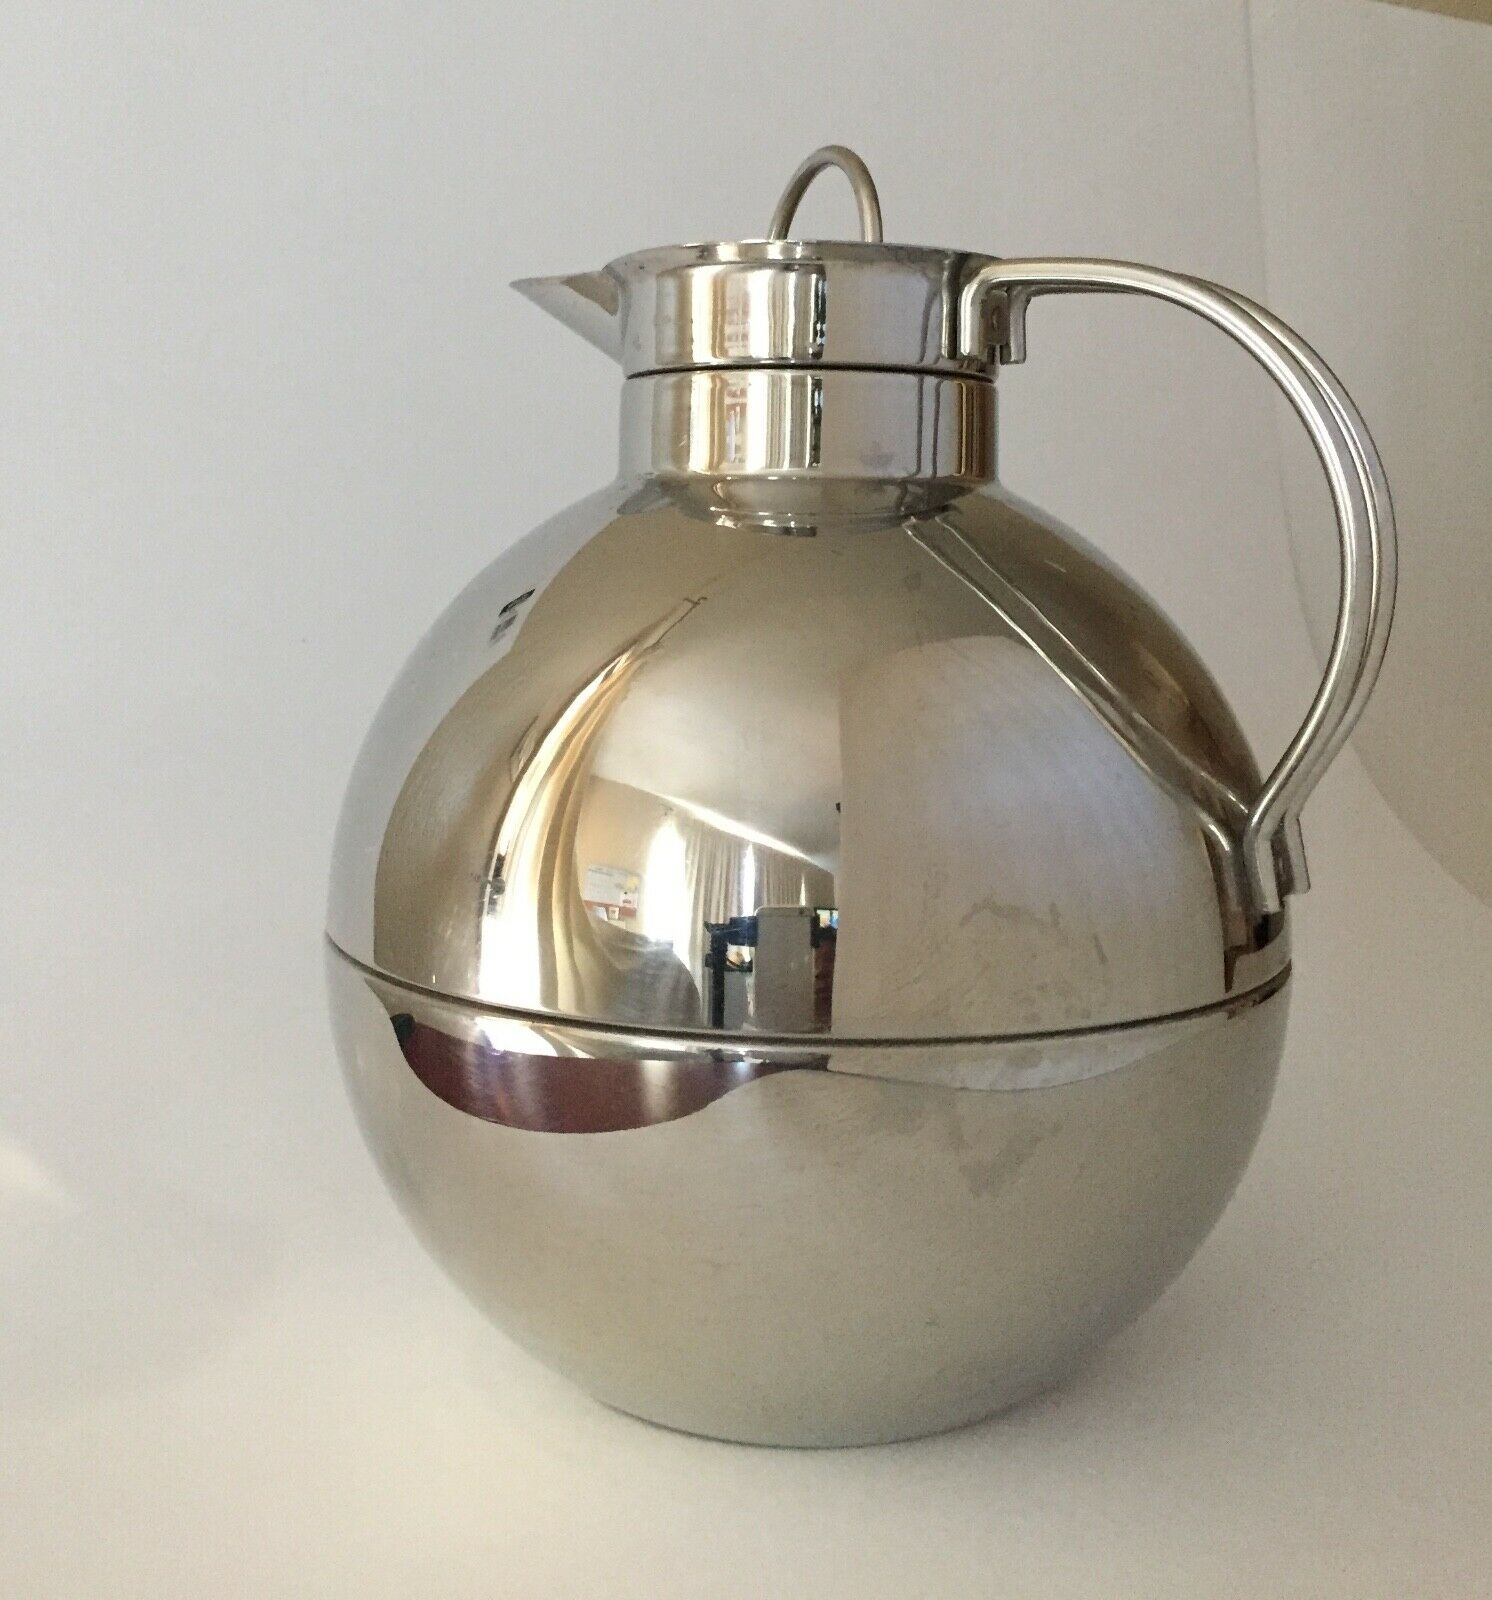 Alfi chaud froid thermique carafe Kugel en acier inoxydable, 101-1.5 litres